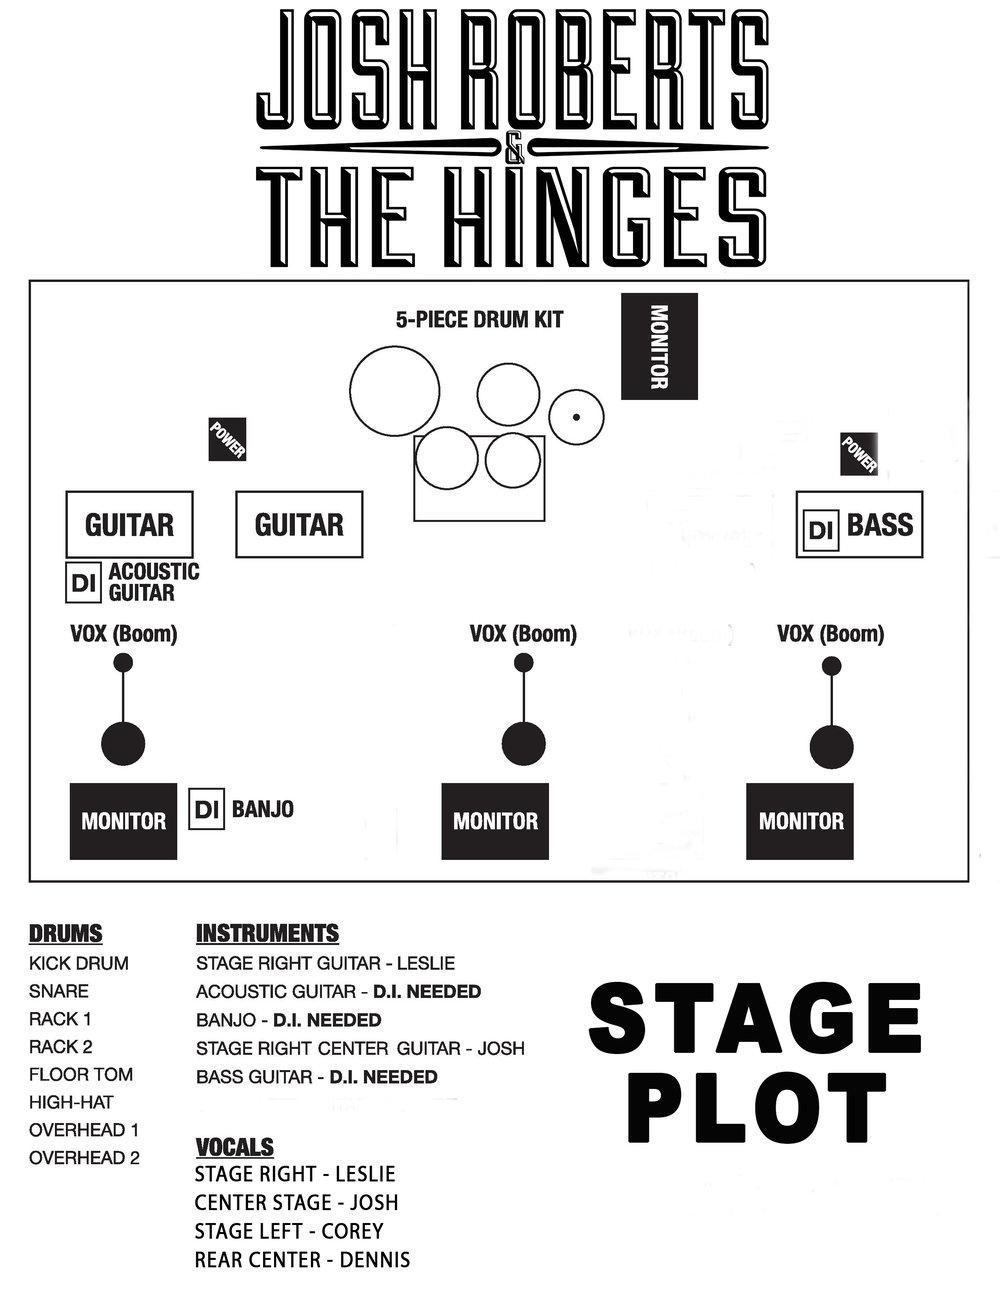 Download Stage Plot